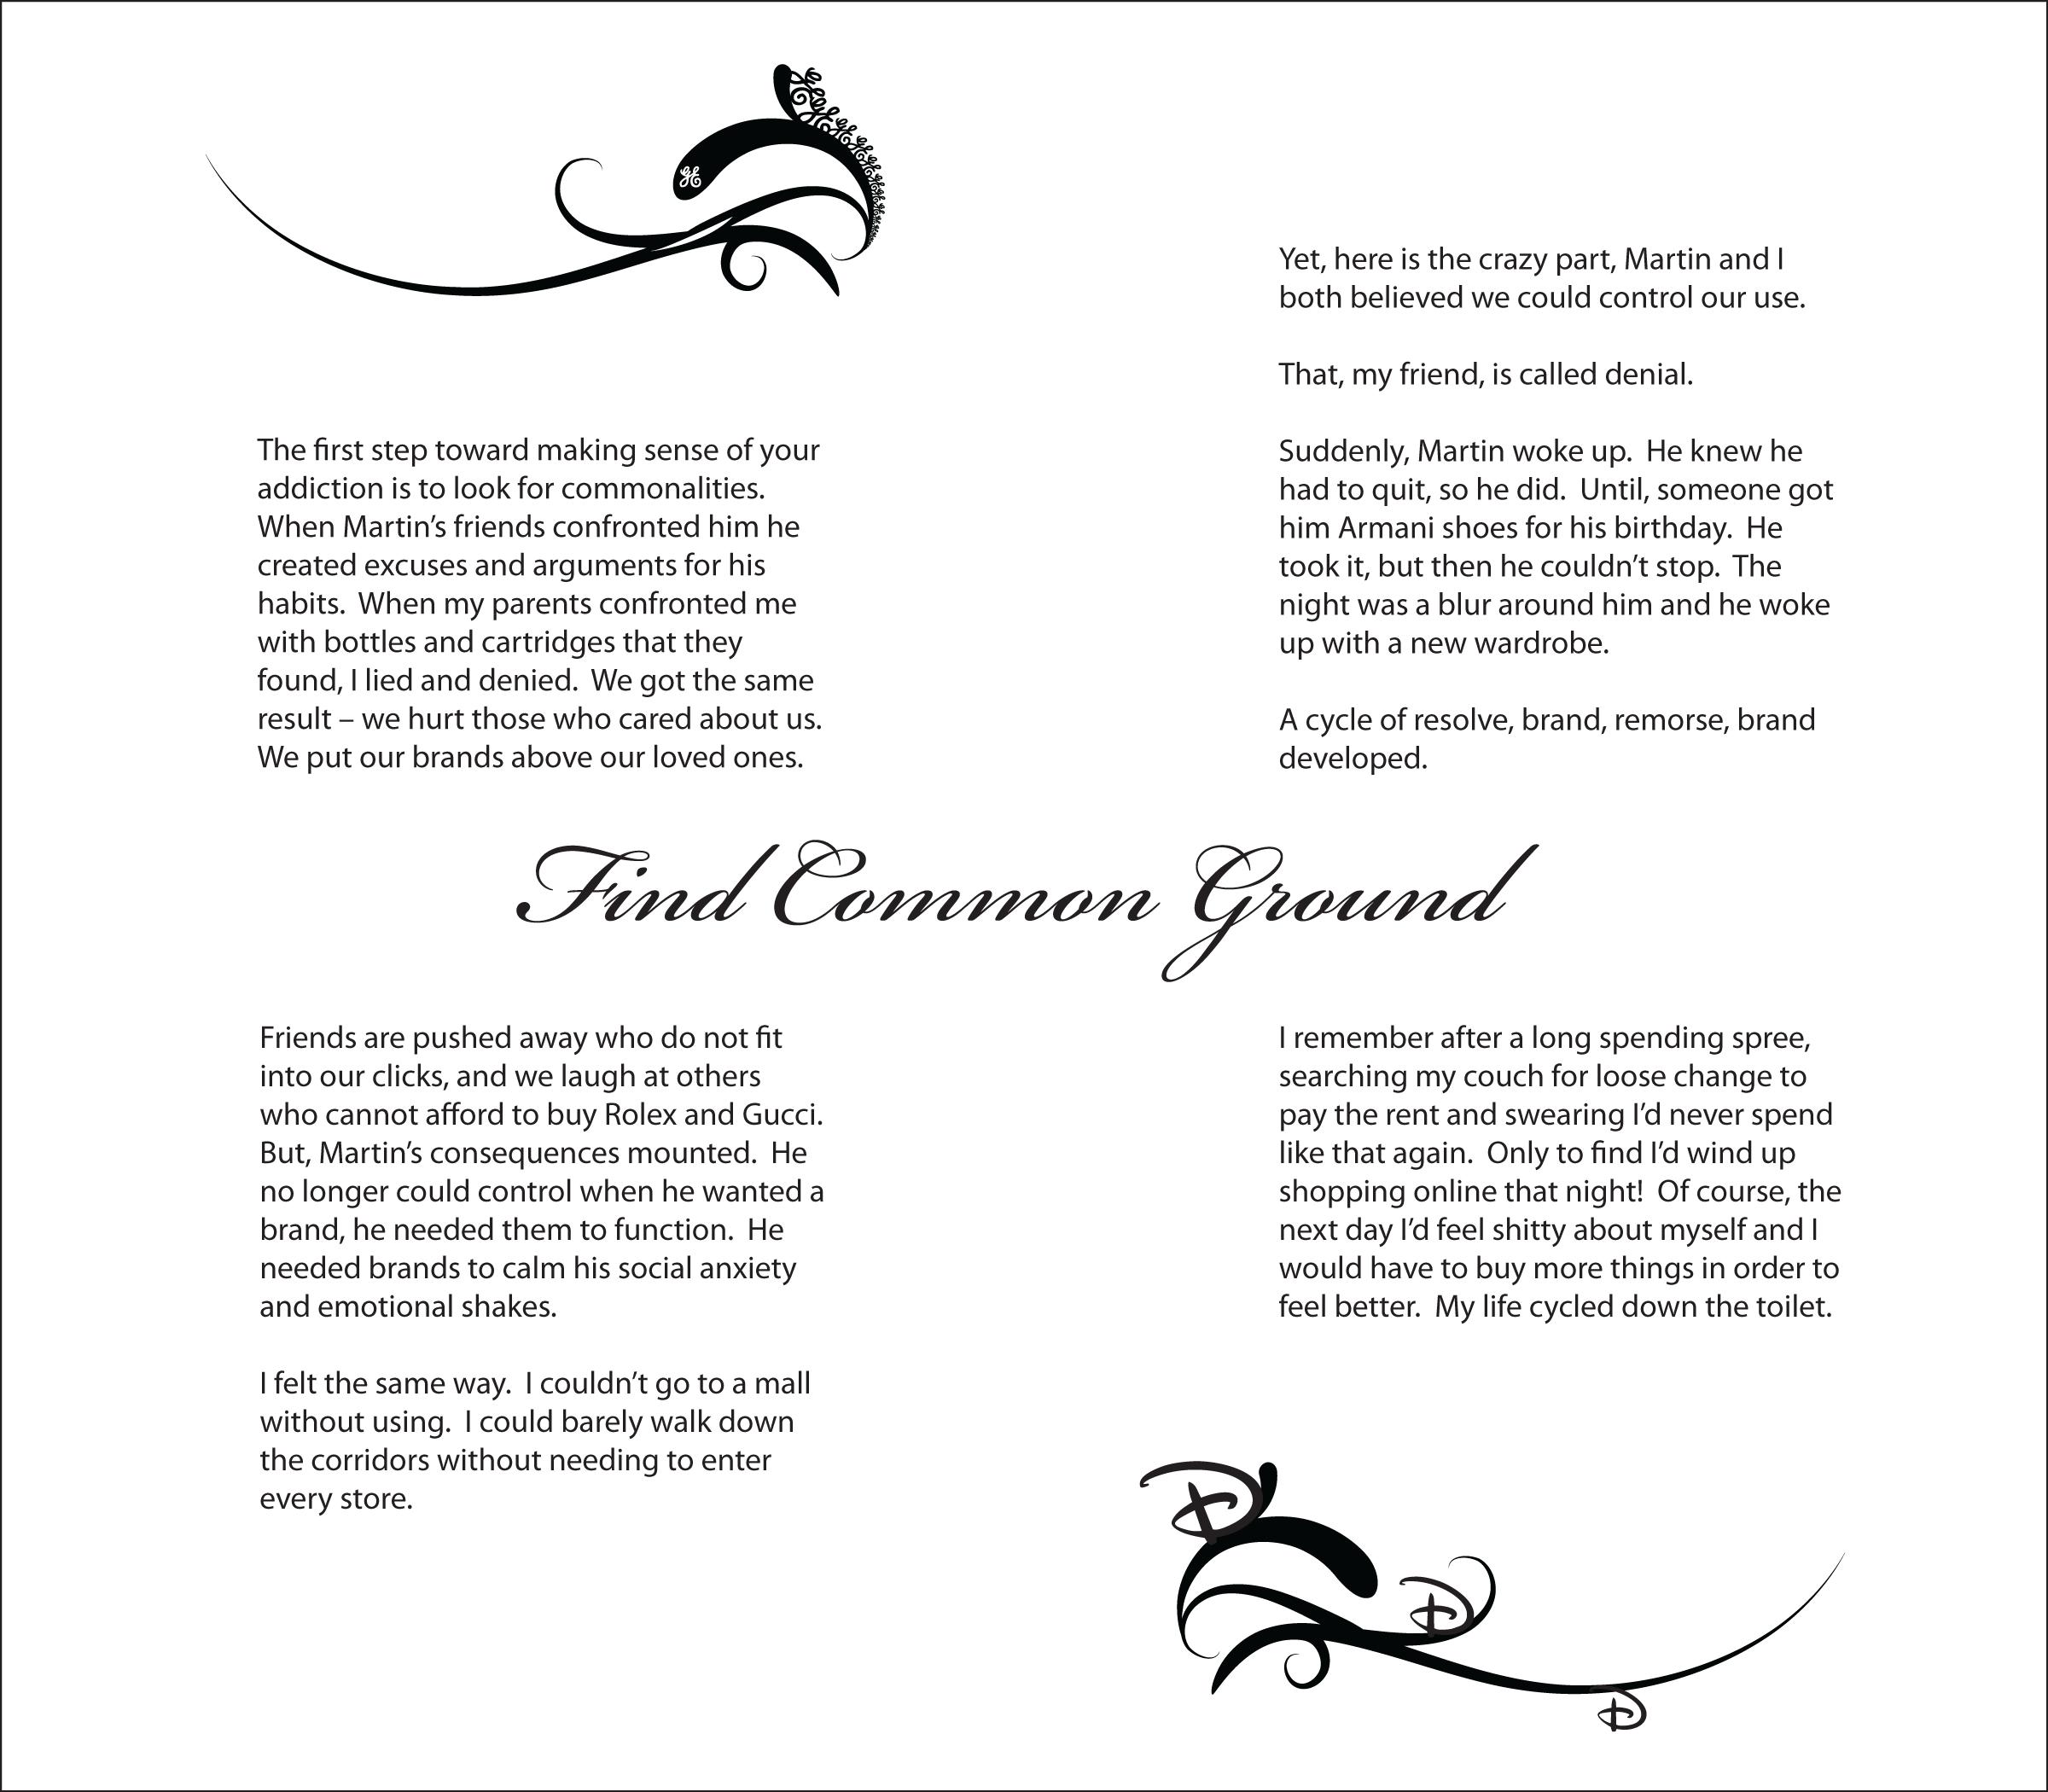 Brandaholics Page 5-6